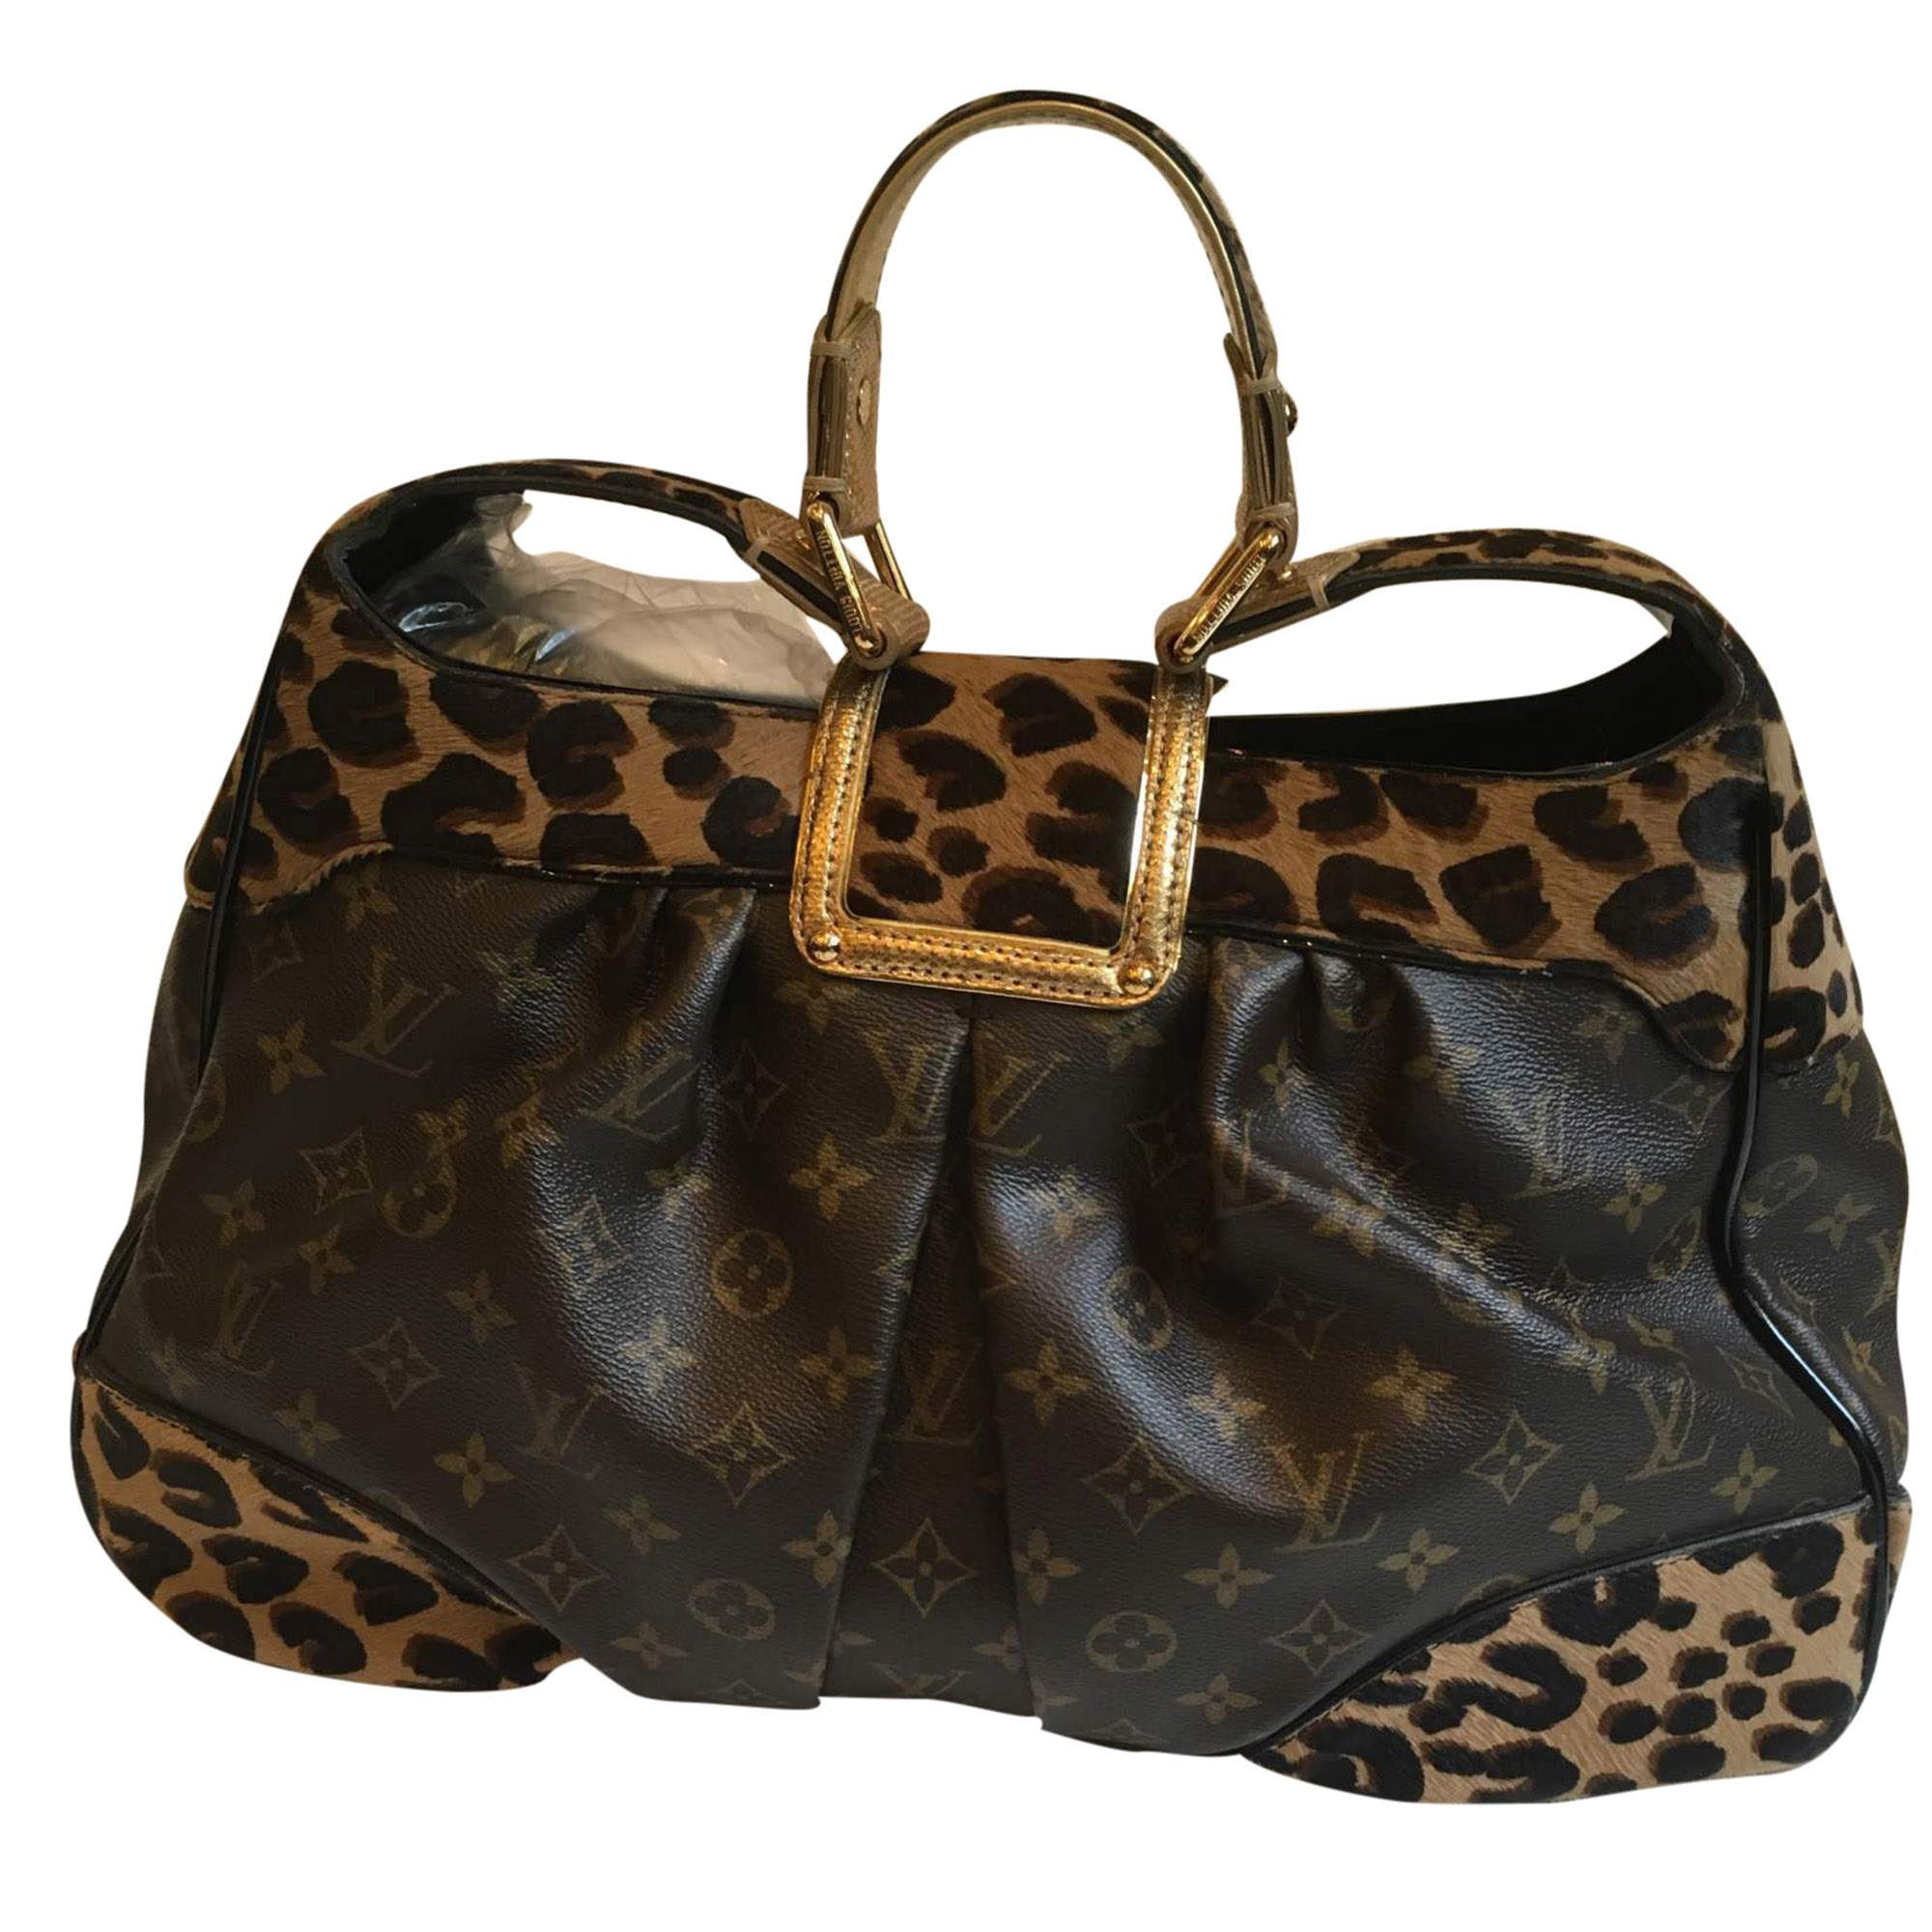 Louis Vuitton Kimono Tote Bag   Bragmybag